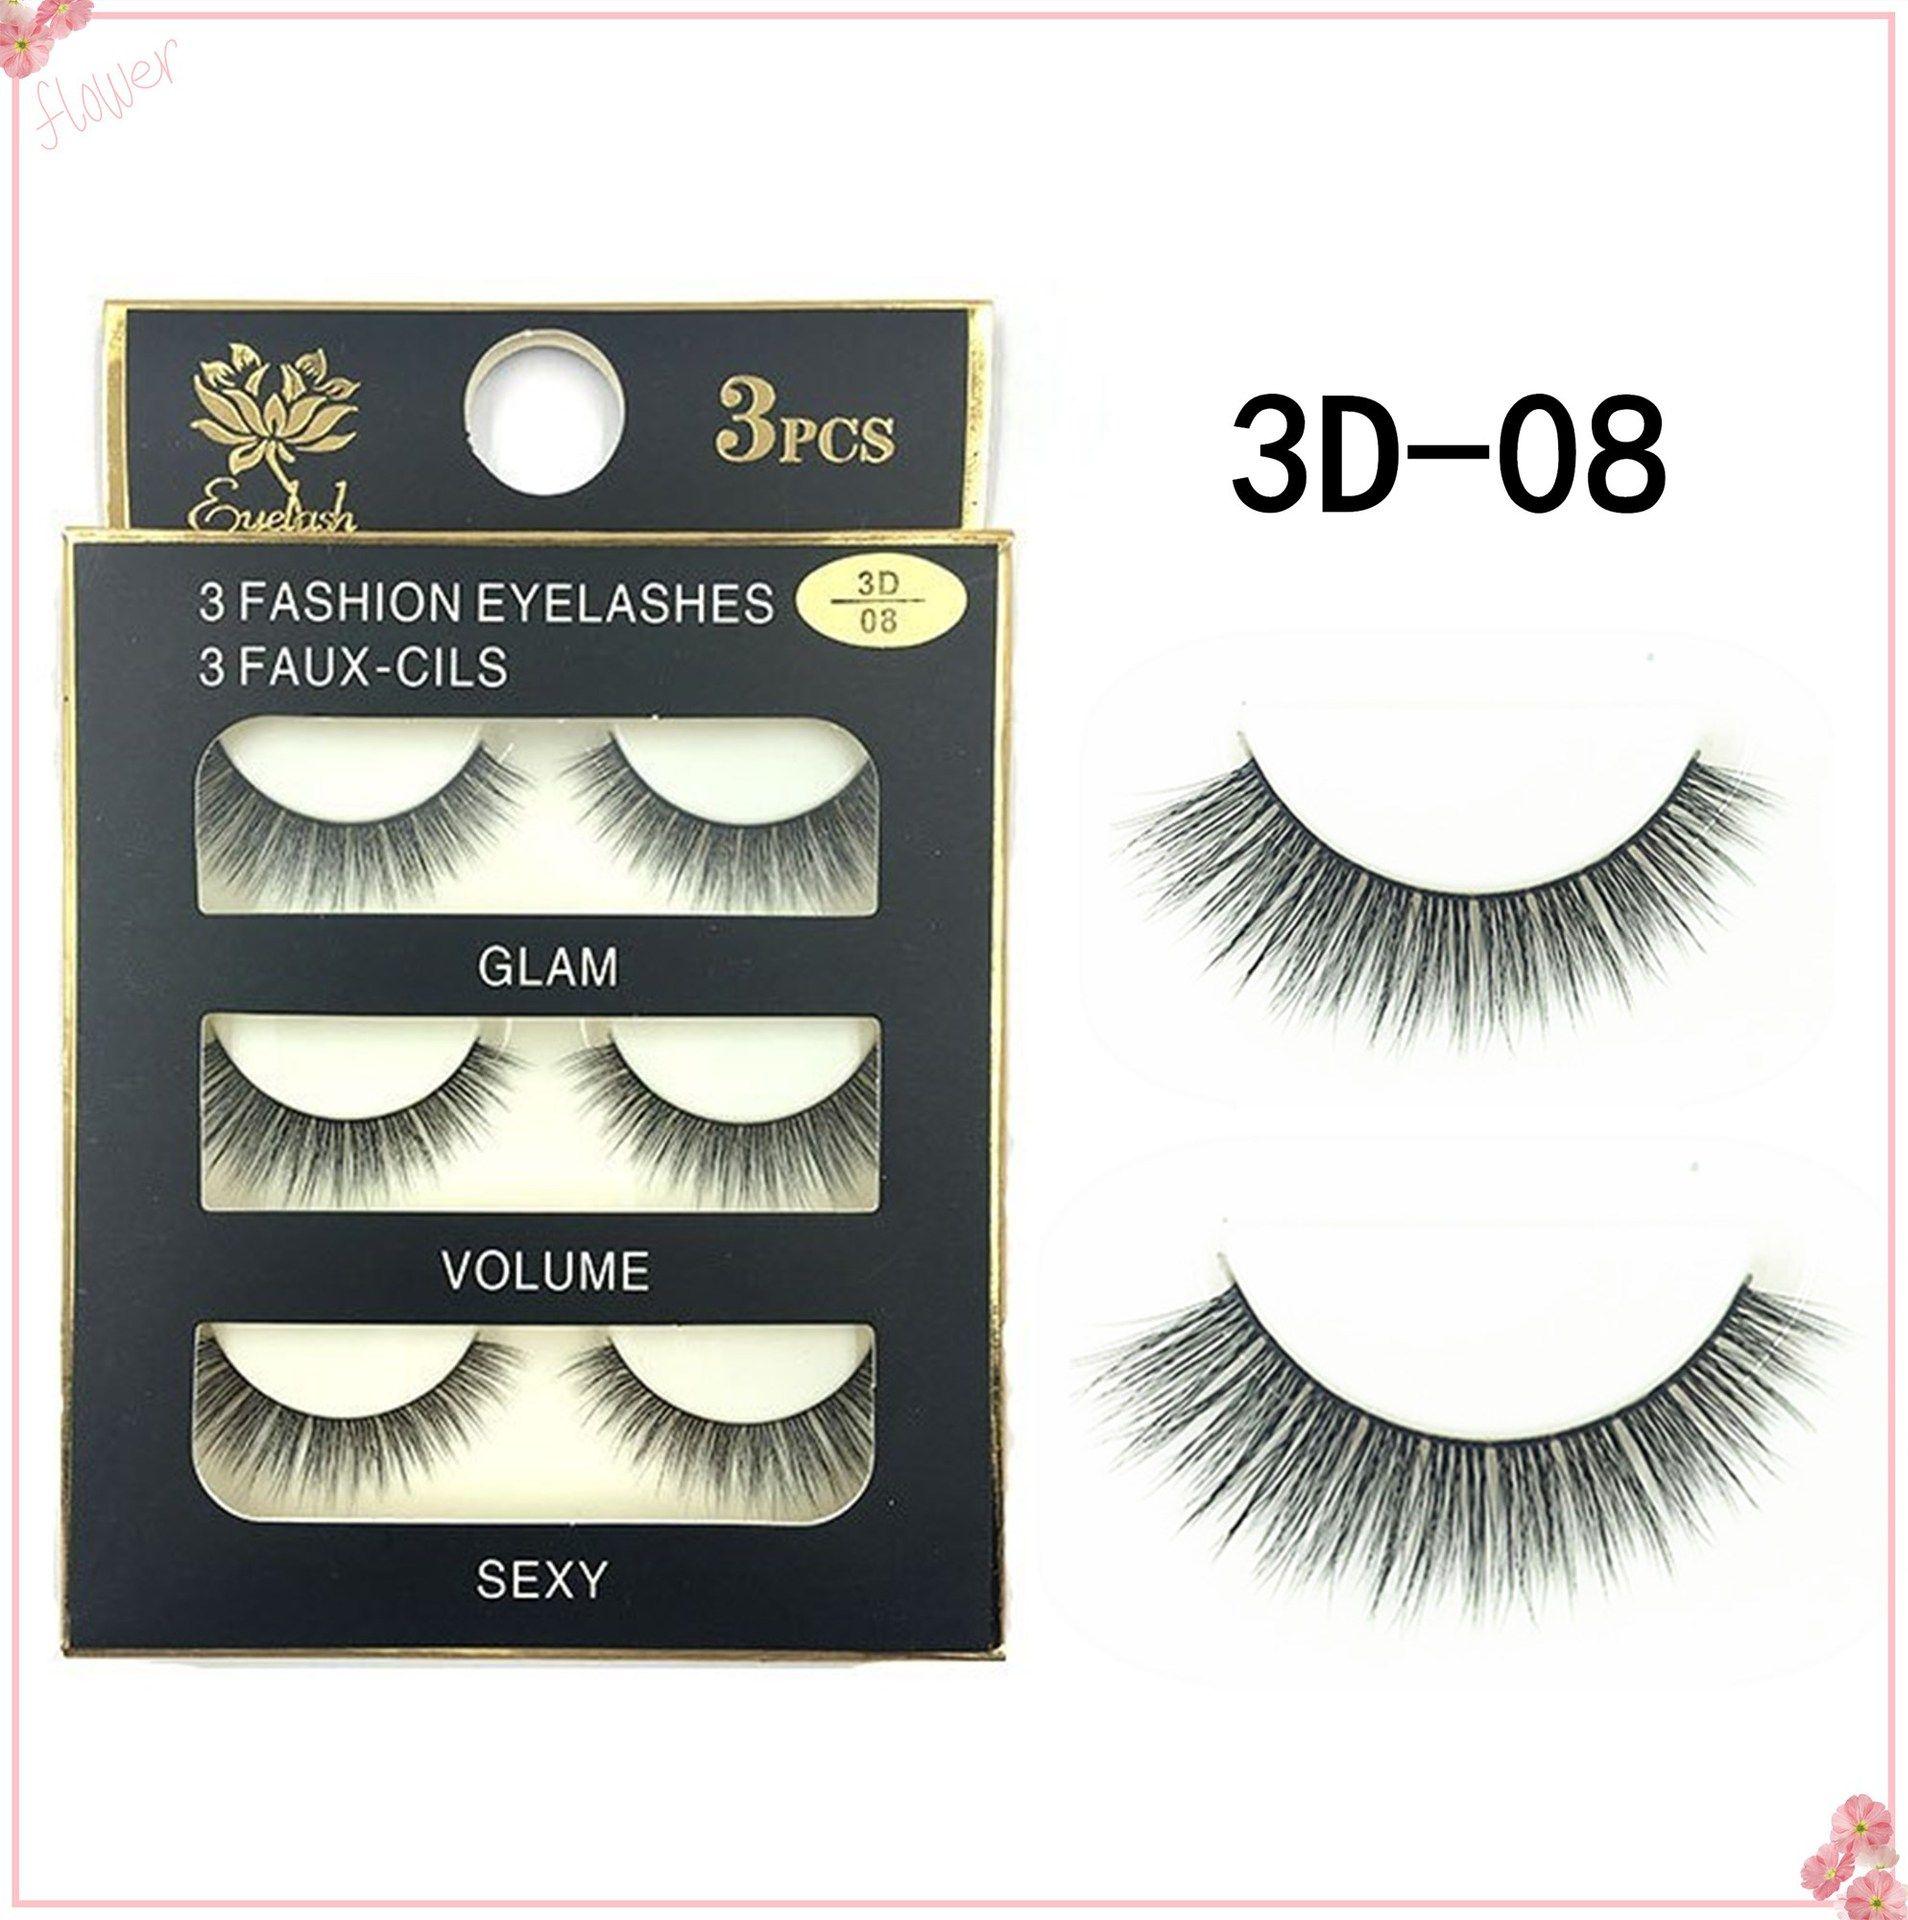 2d05c83271c New Stye New 3D Natural Cross Thick Curly Messy False Eyelashes Long Makeup  3D Lashes Fake Eye Lashes Extension Make Up Beauty Eyelashes Eyelash  Extensions ...